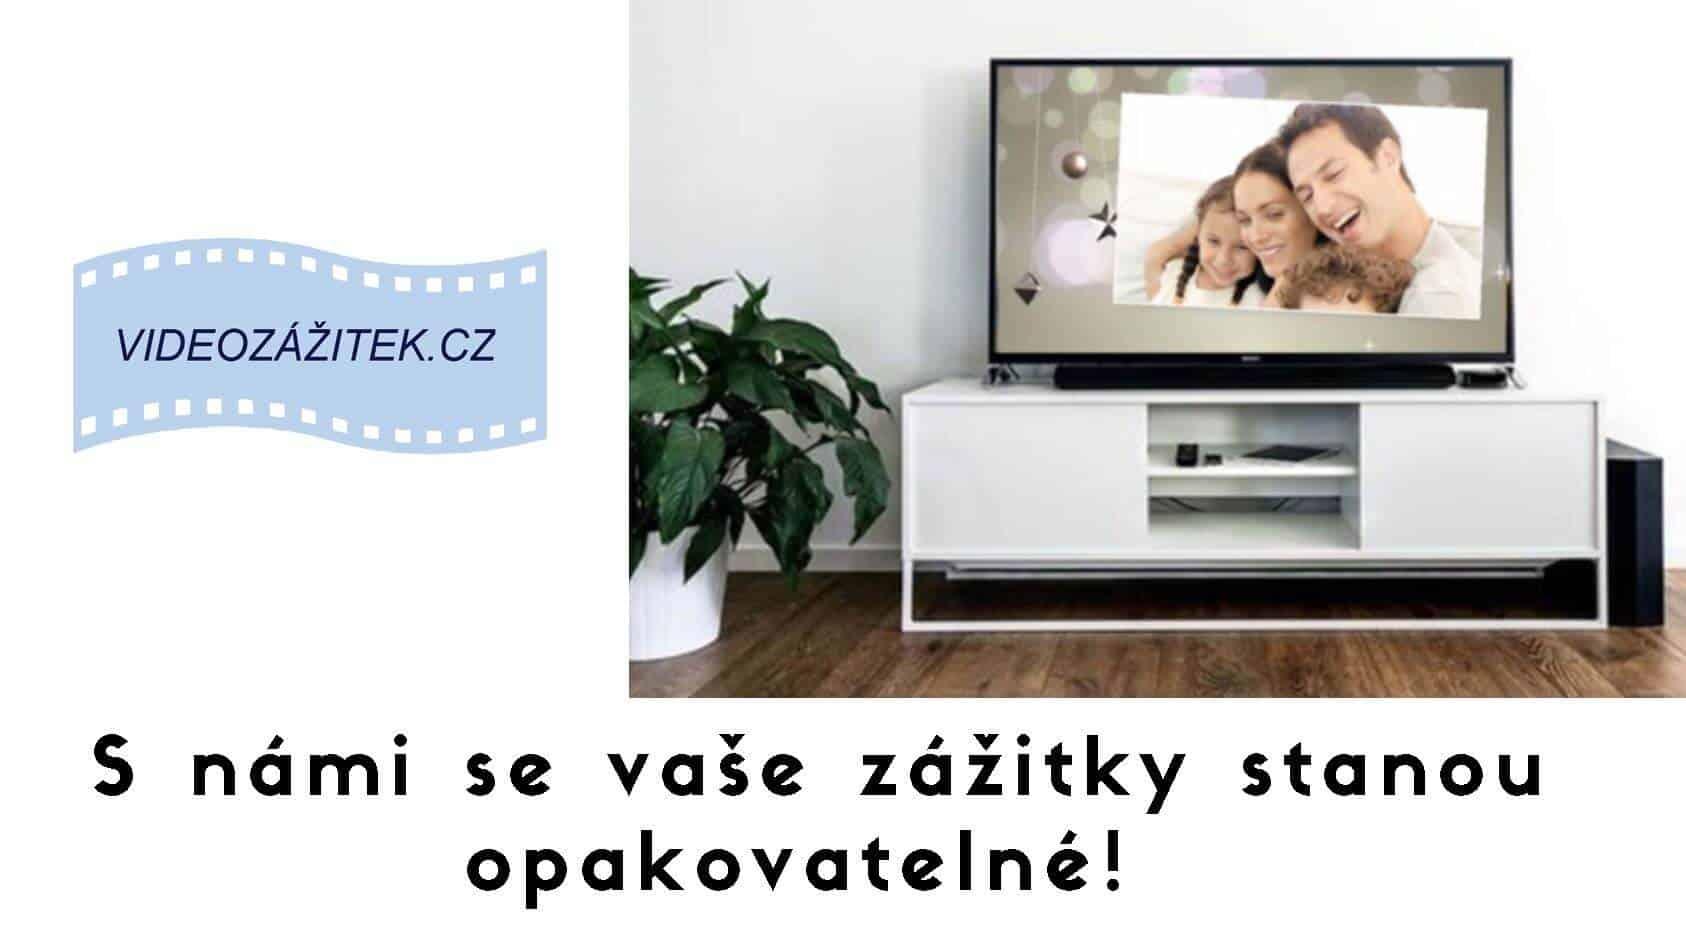 videozazitek.cz